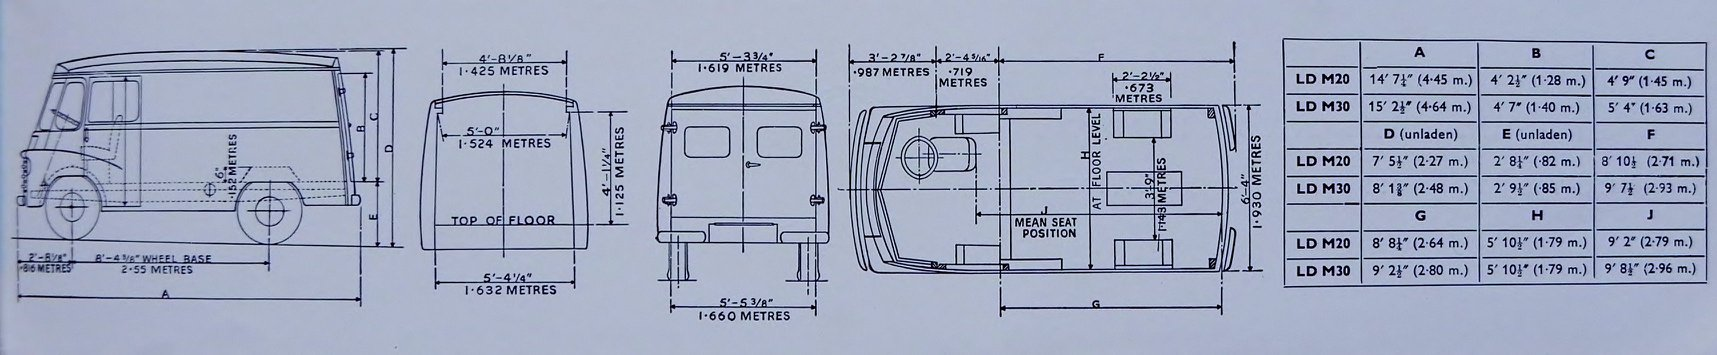 Morris-LD--1963-15